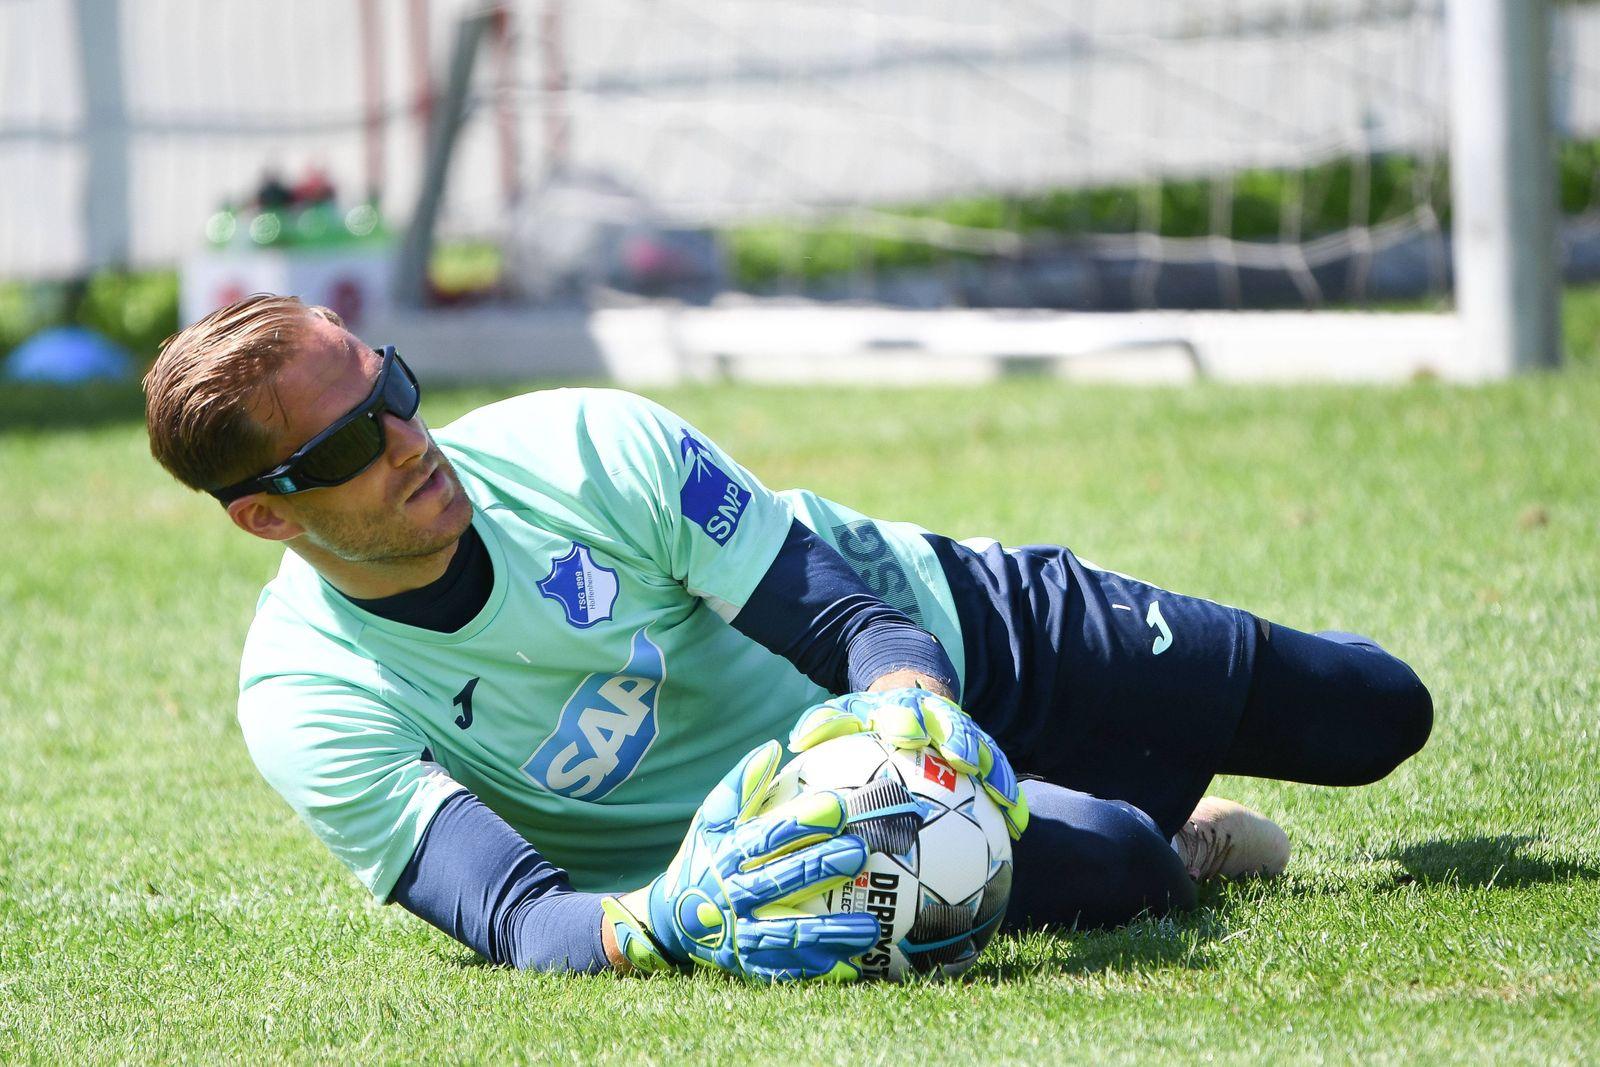 Sport Bilder des Tages 23 07 2019 xmeix 1 Fussball Bundesliga Trainingslager TSG 1899 Hoffenhei